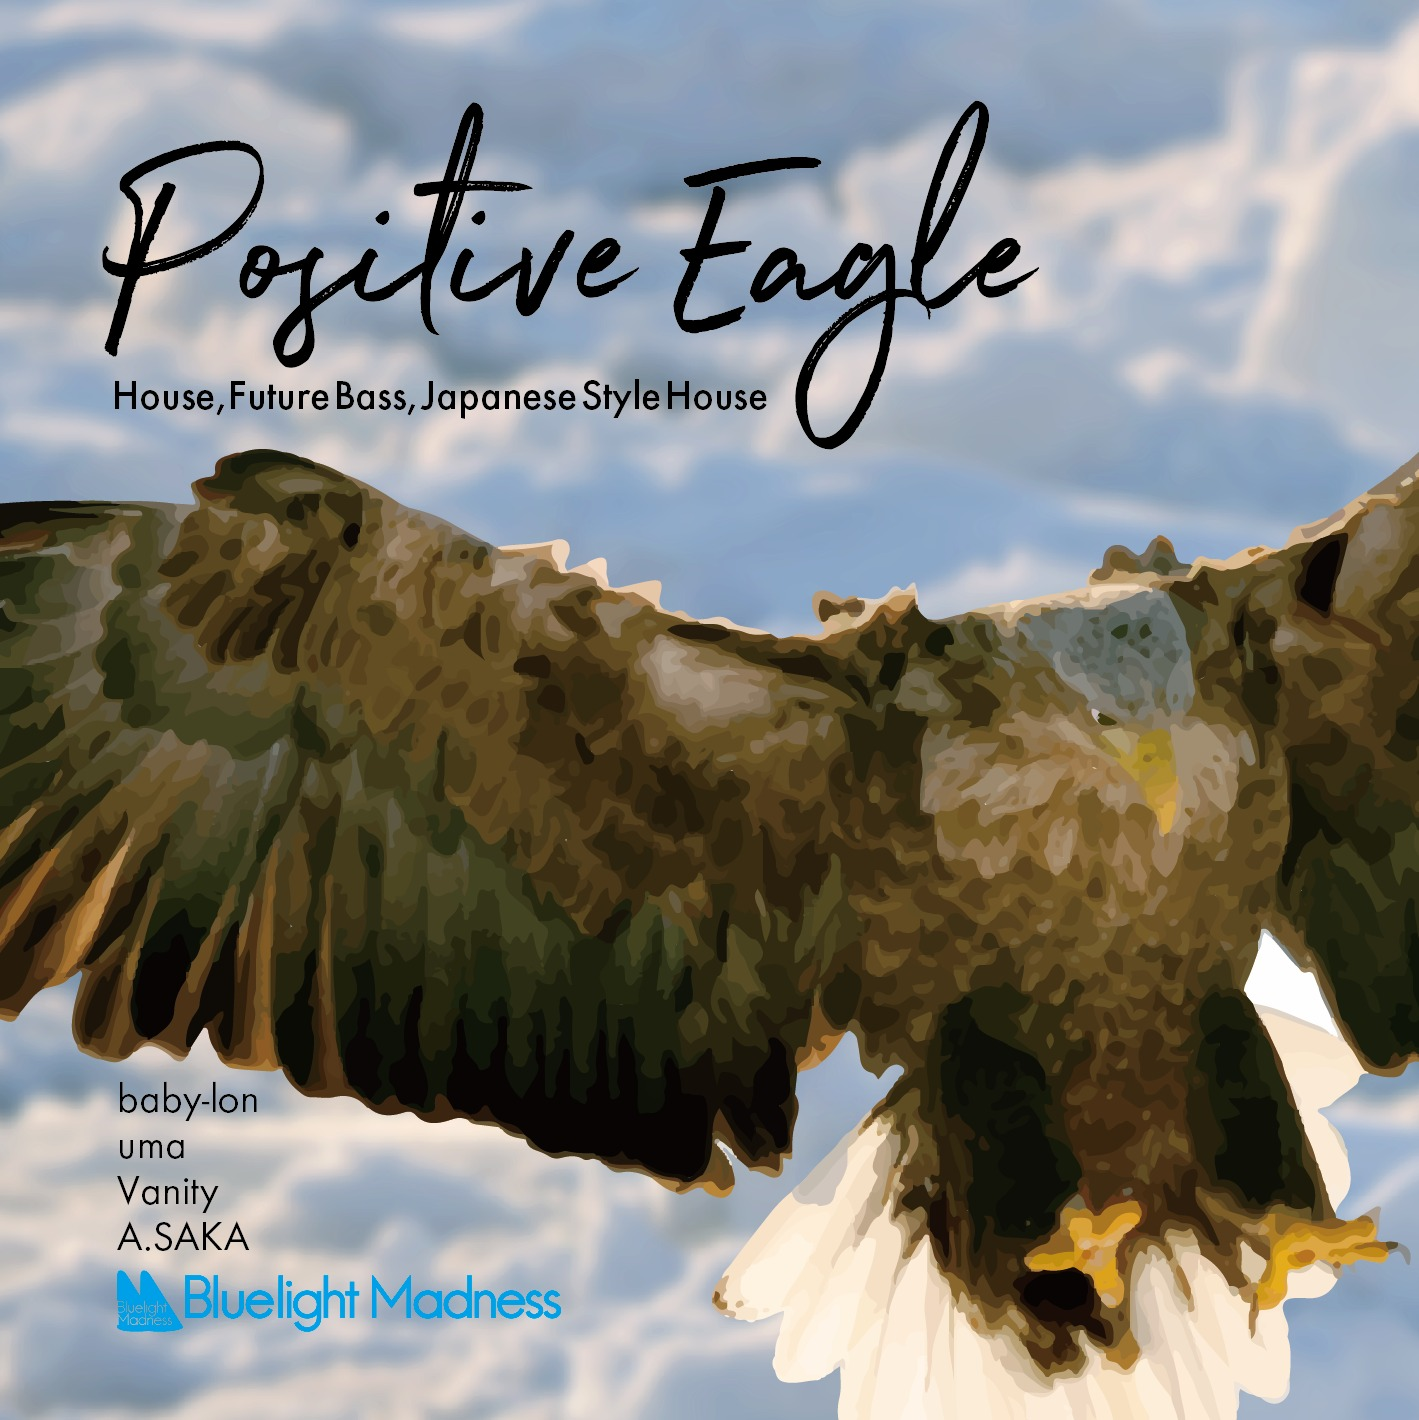 Positive Eagle